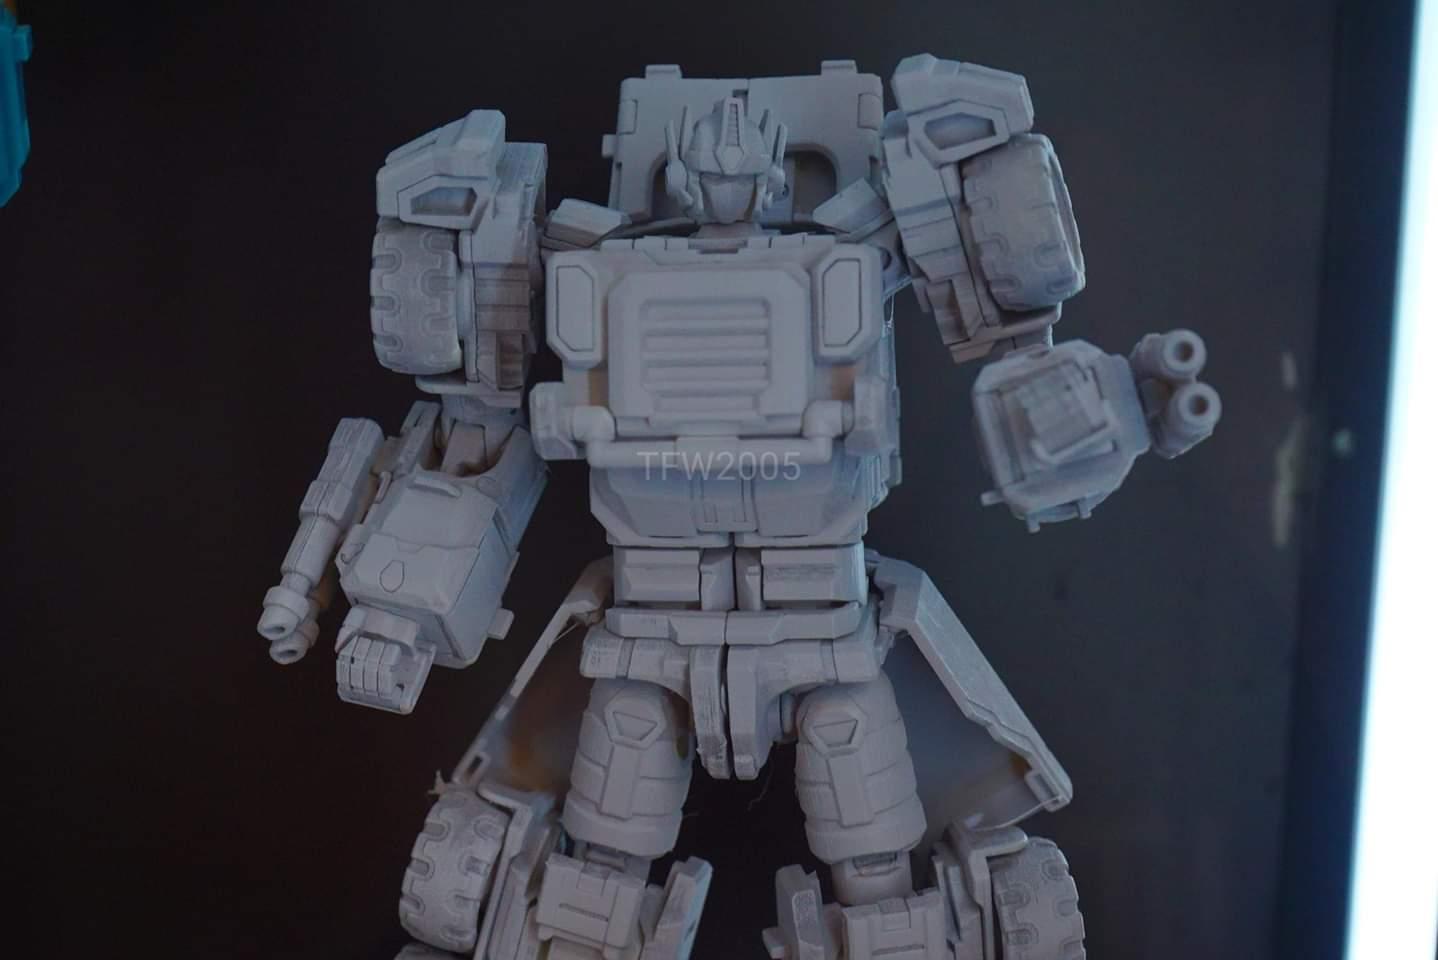 [FansHobby] Produit Tiers - Master Builder MB-15, MB-xx et MB-xx - aka Armada Optimus Prime, Jetfire et Overload 7AtHnh47_o